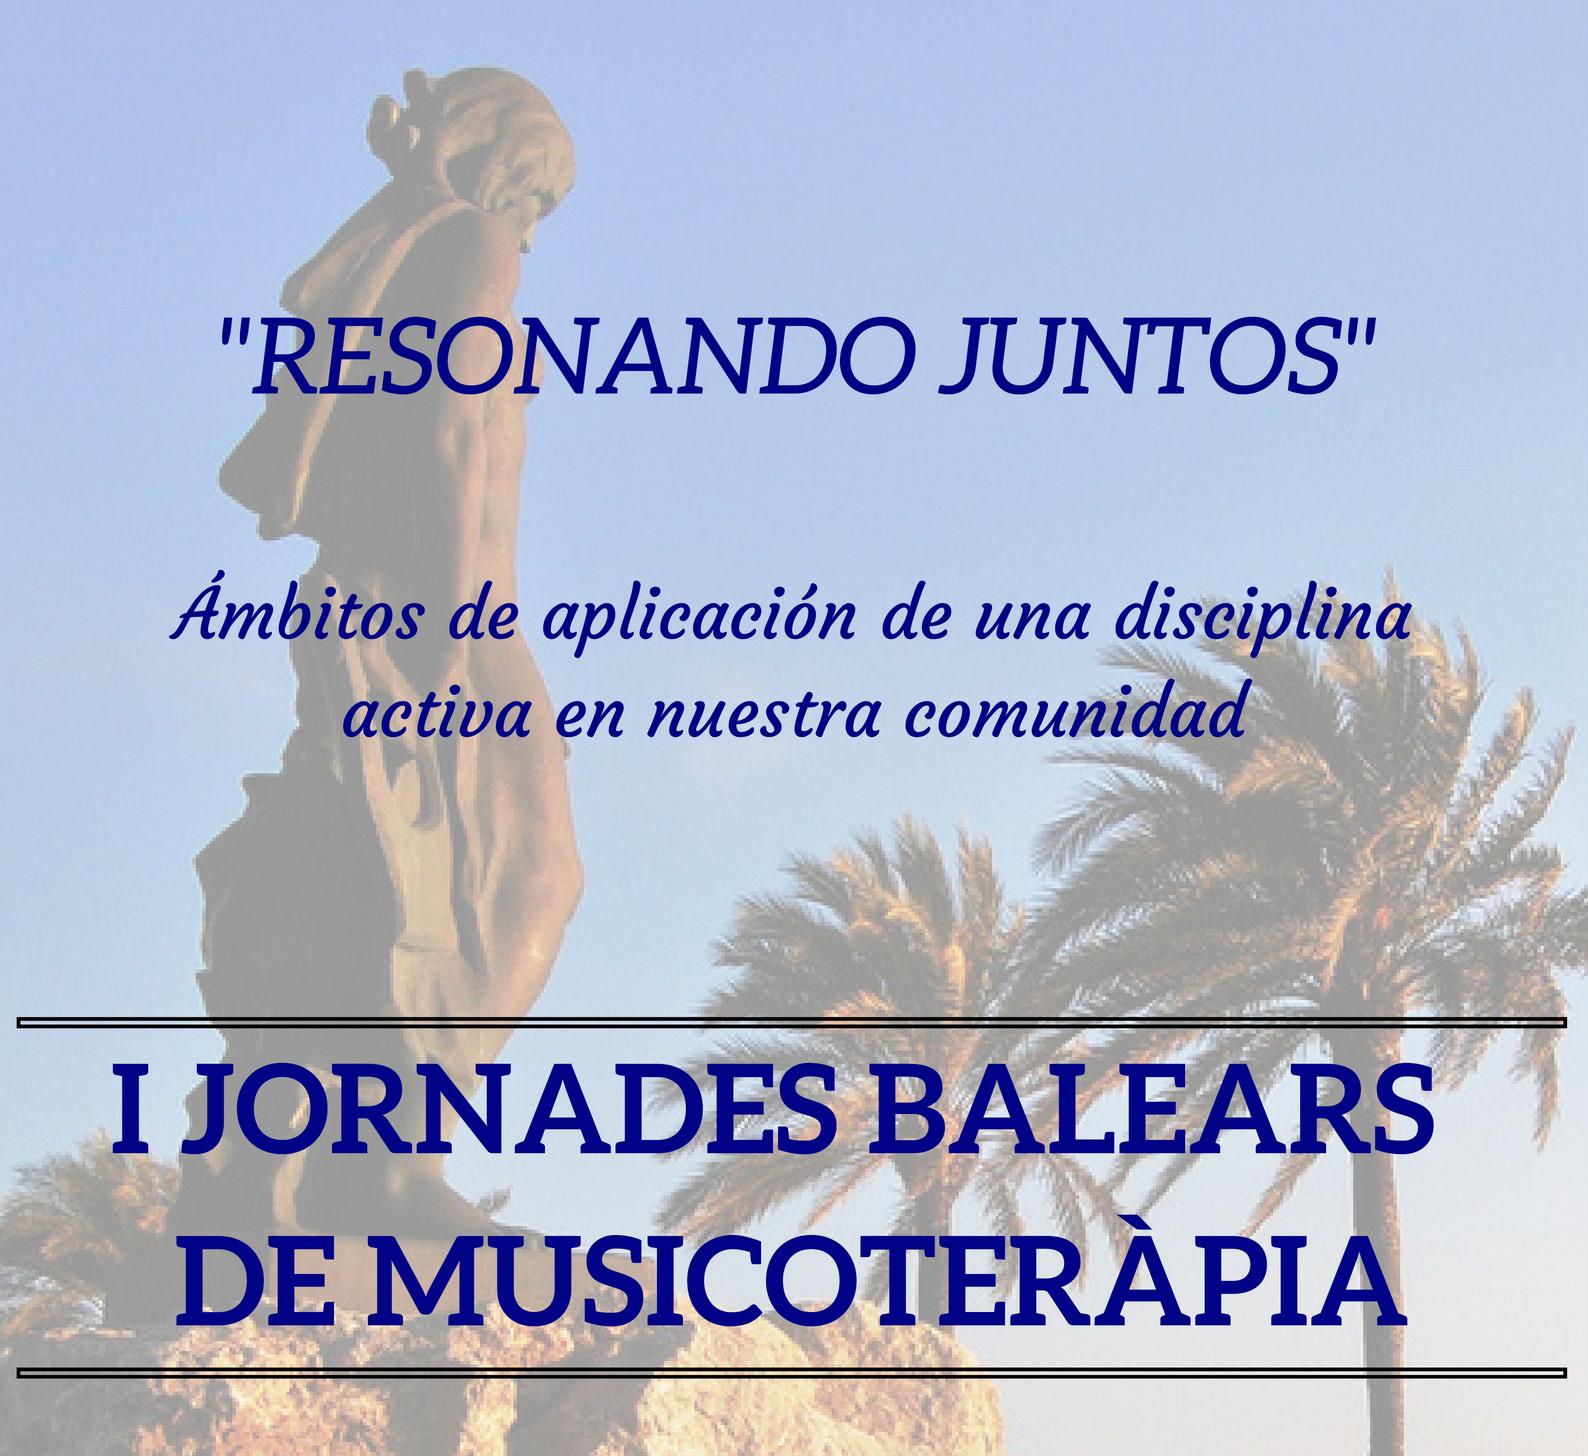 Resumen de las I Jornadas Baleares de Musicoterapia